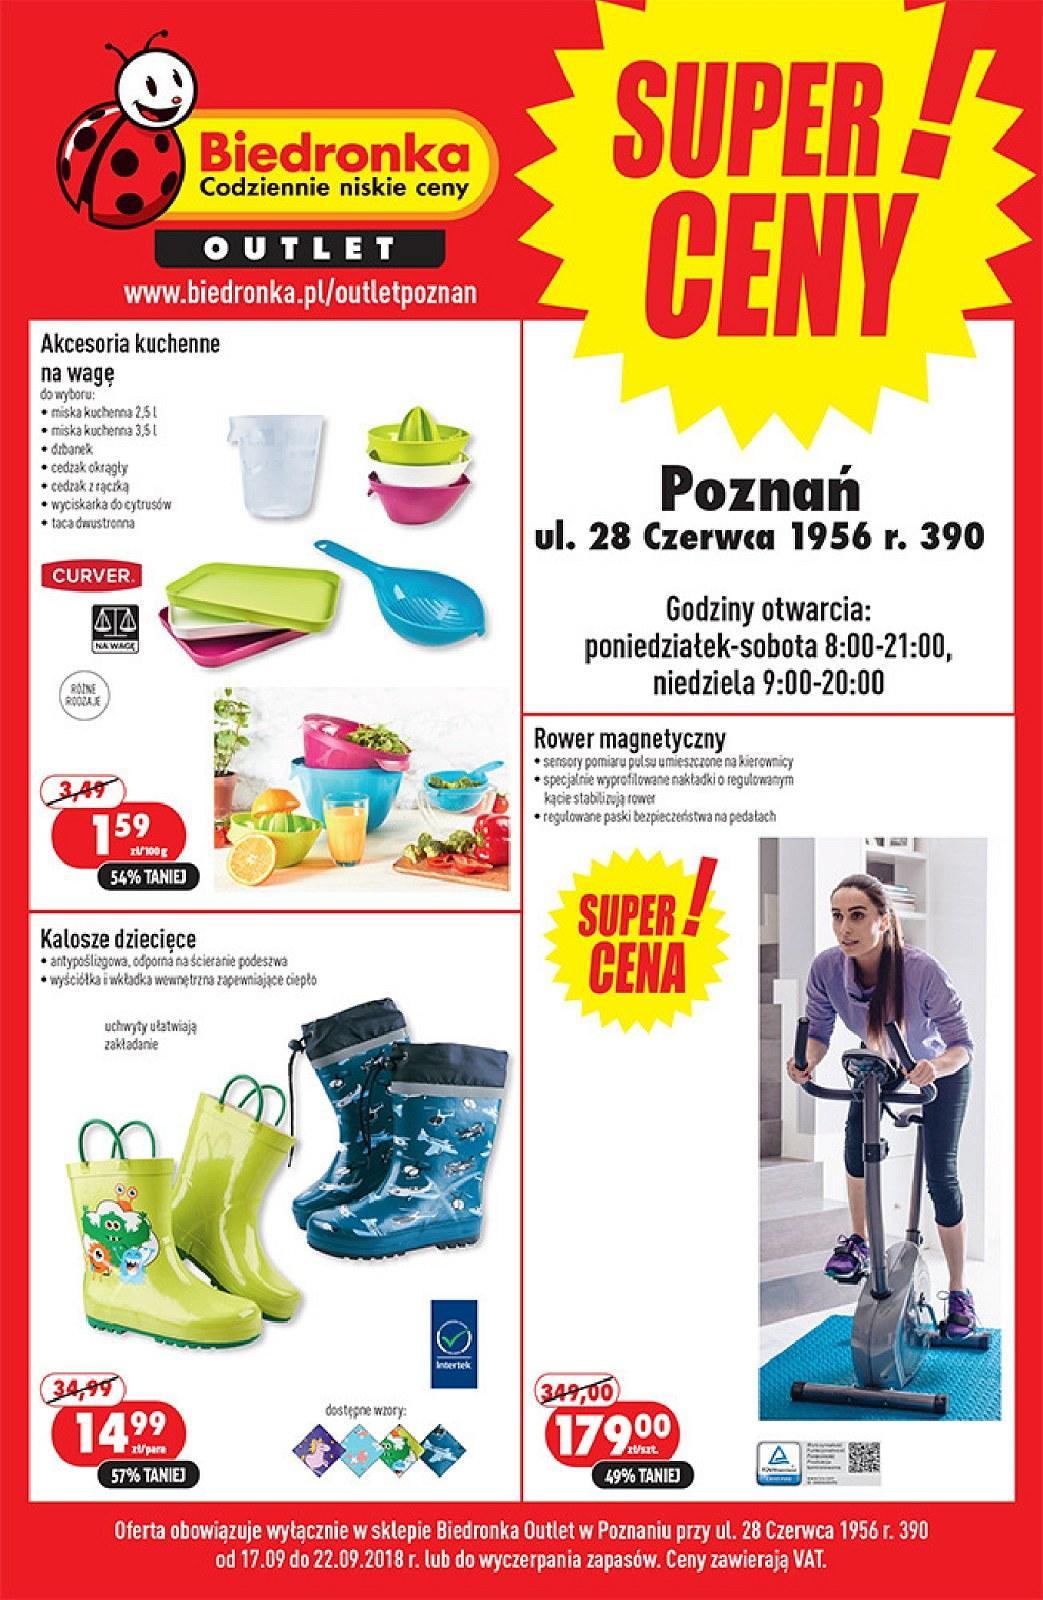 Gazetka promocyjna Biedronka Outlet do 22/09/2018 str.1